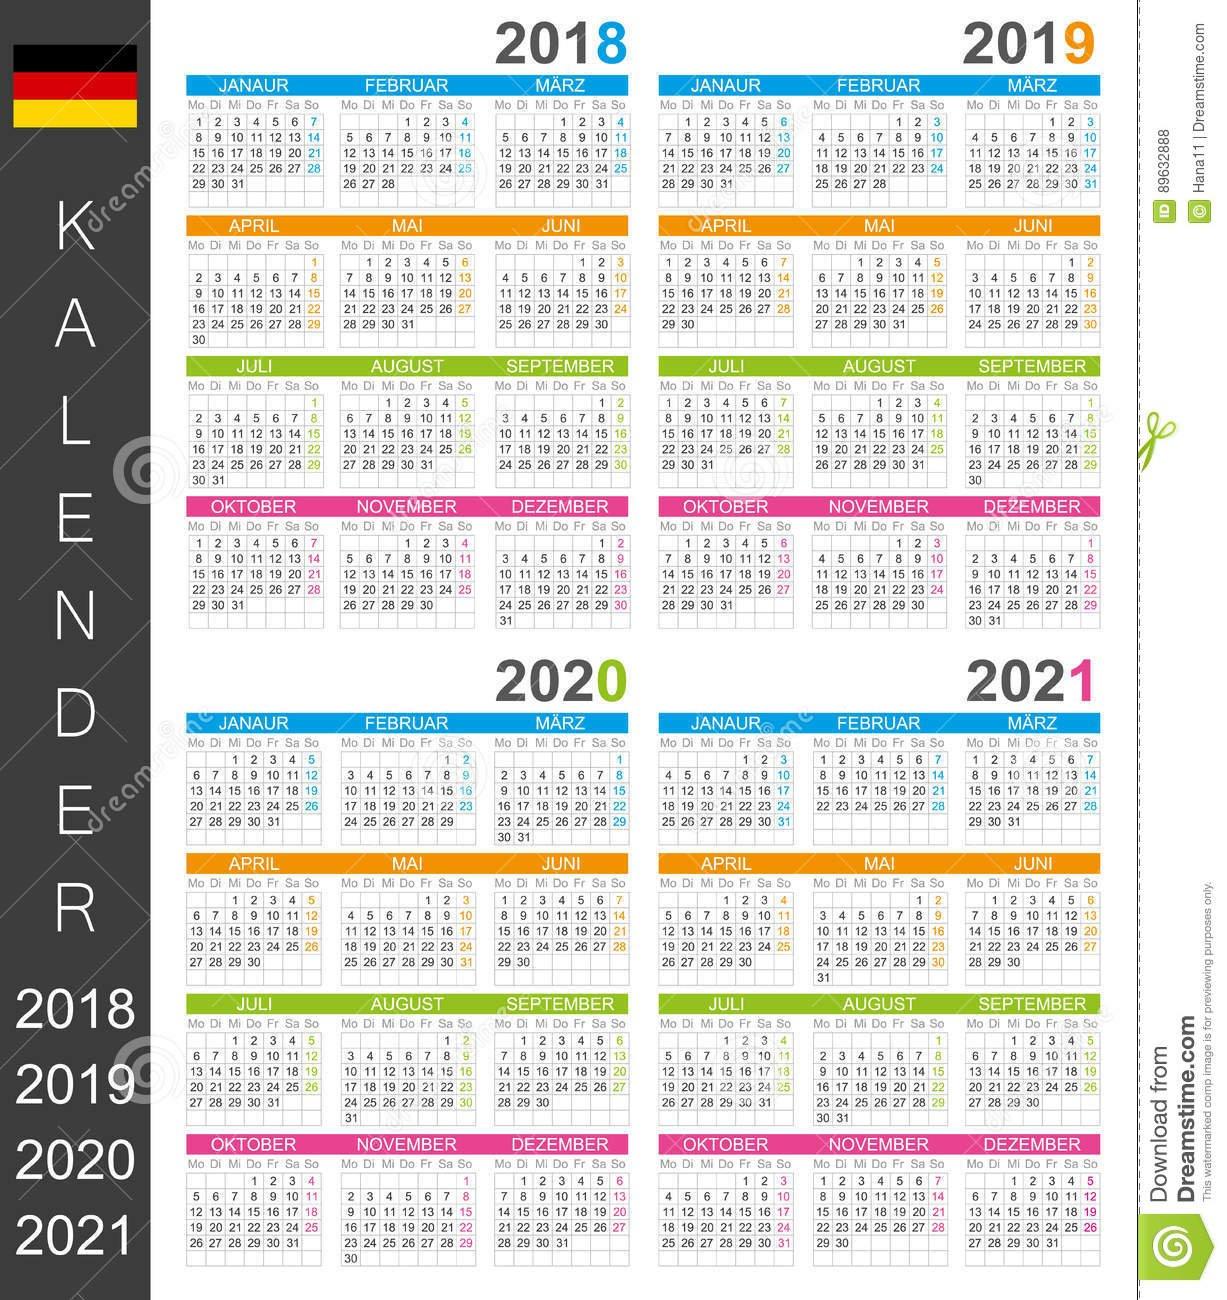 Calendar 2018 2021 Stock Illustration. Illustration Of Personal Calendar 2019 Germany Week Numbers